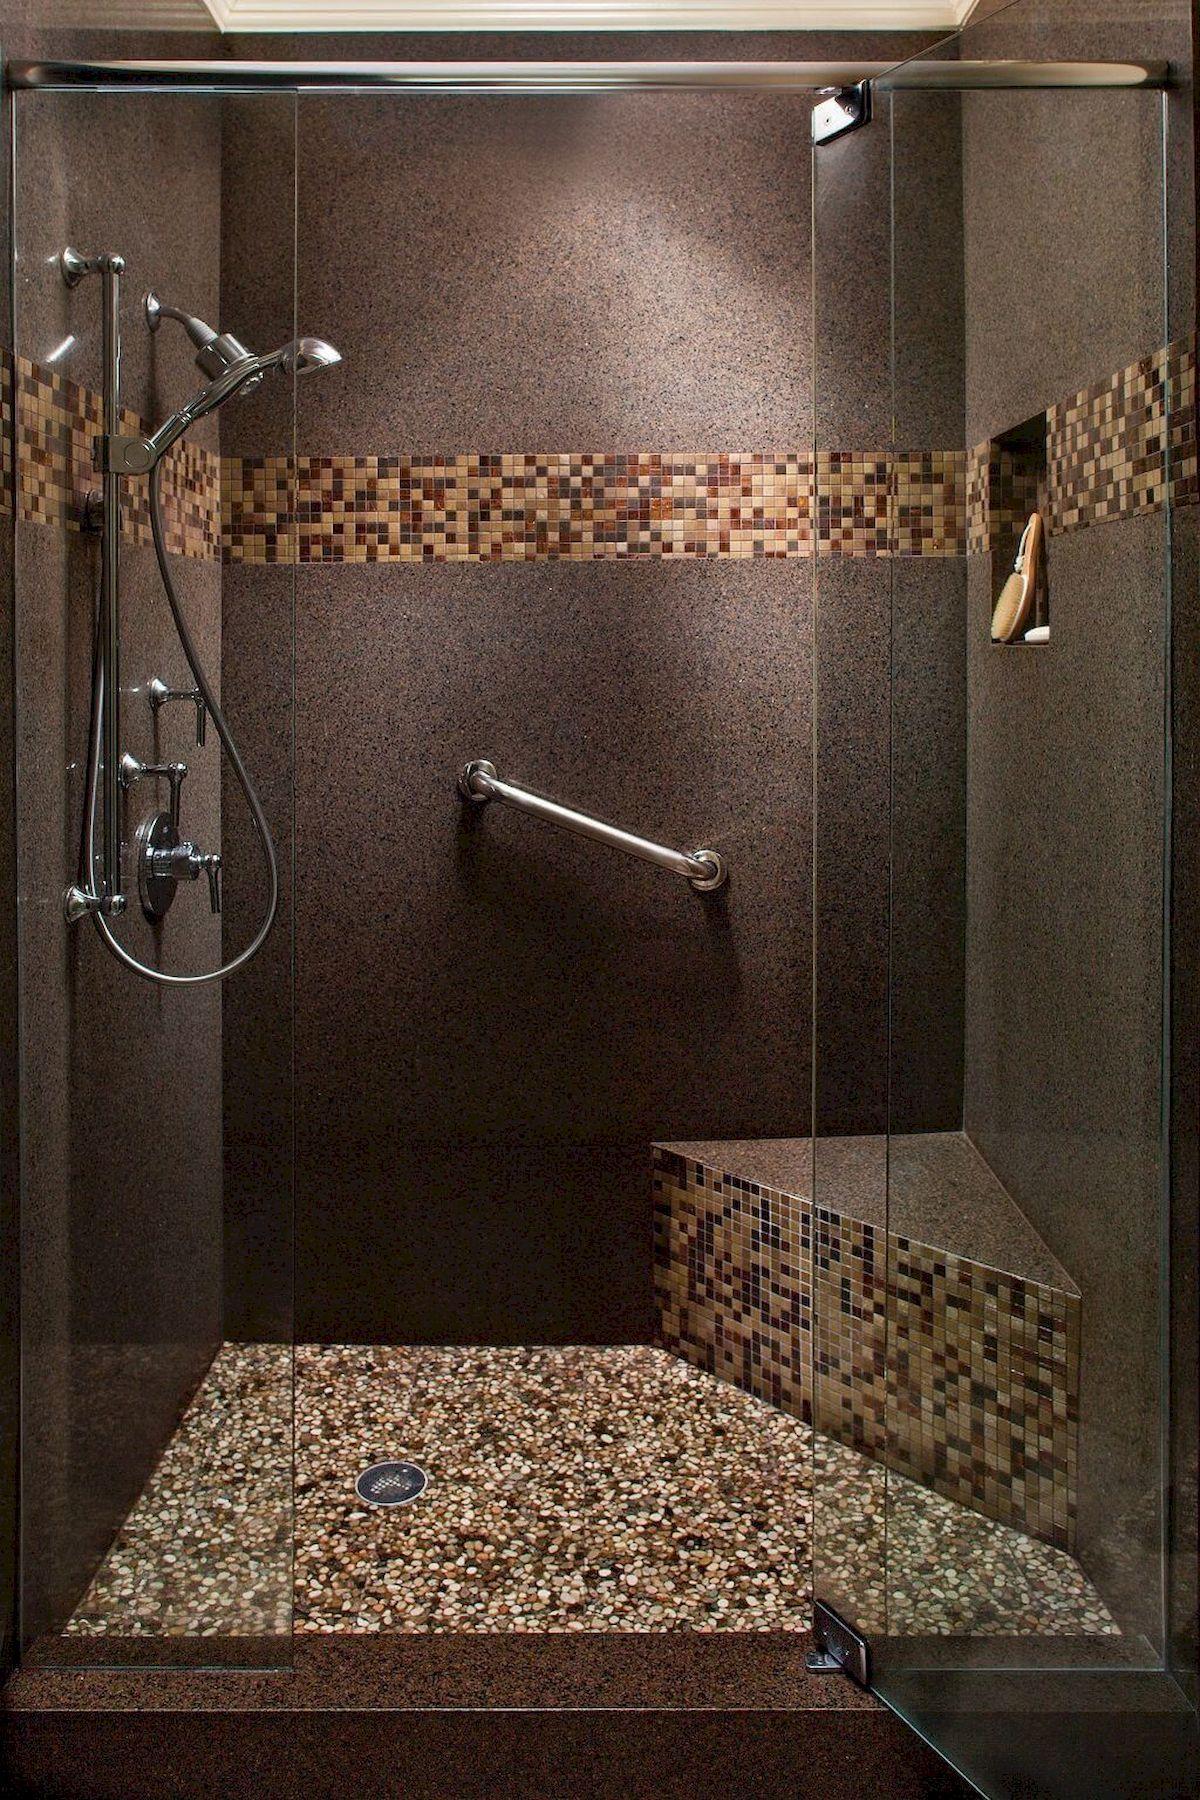 Recouvrir Frise Carrelage Salle De Bain bathroom floor ideas and designs | idée salle de bain